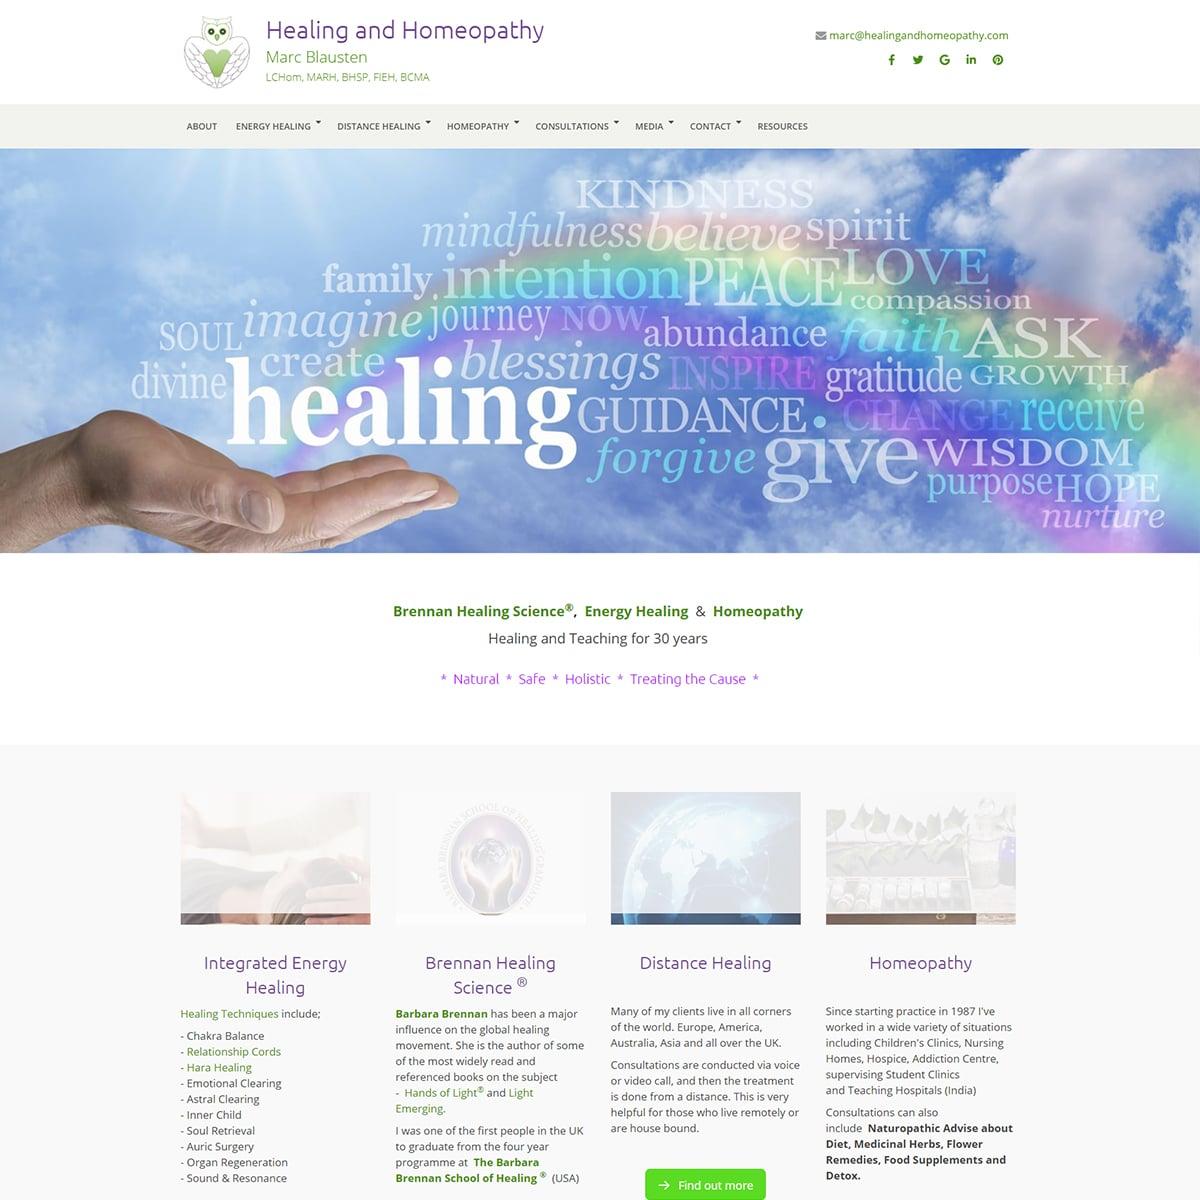 healingandhomeopathy